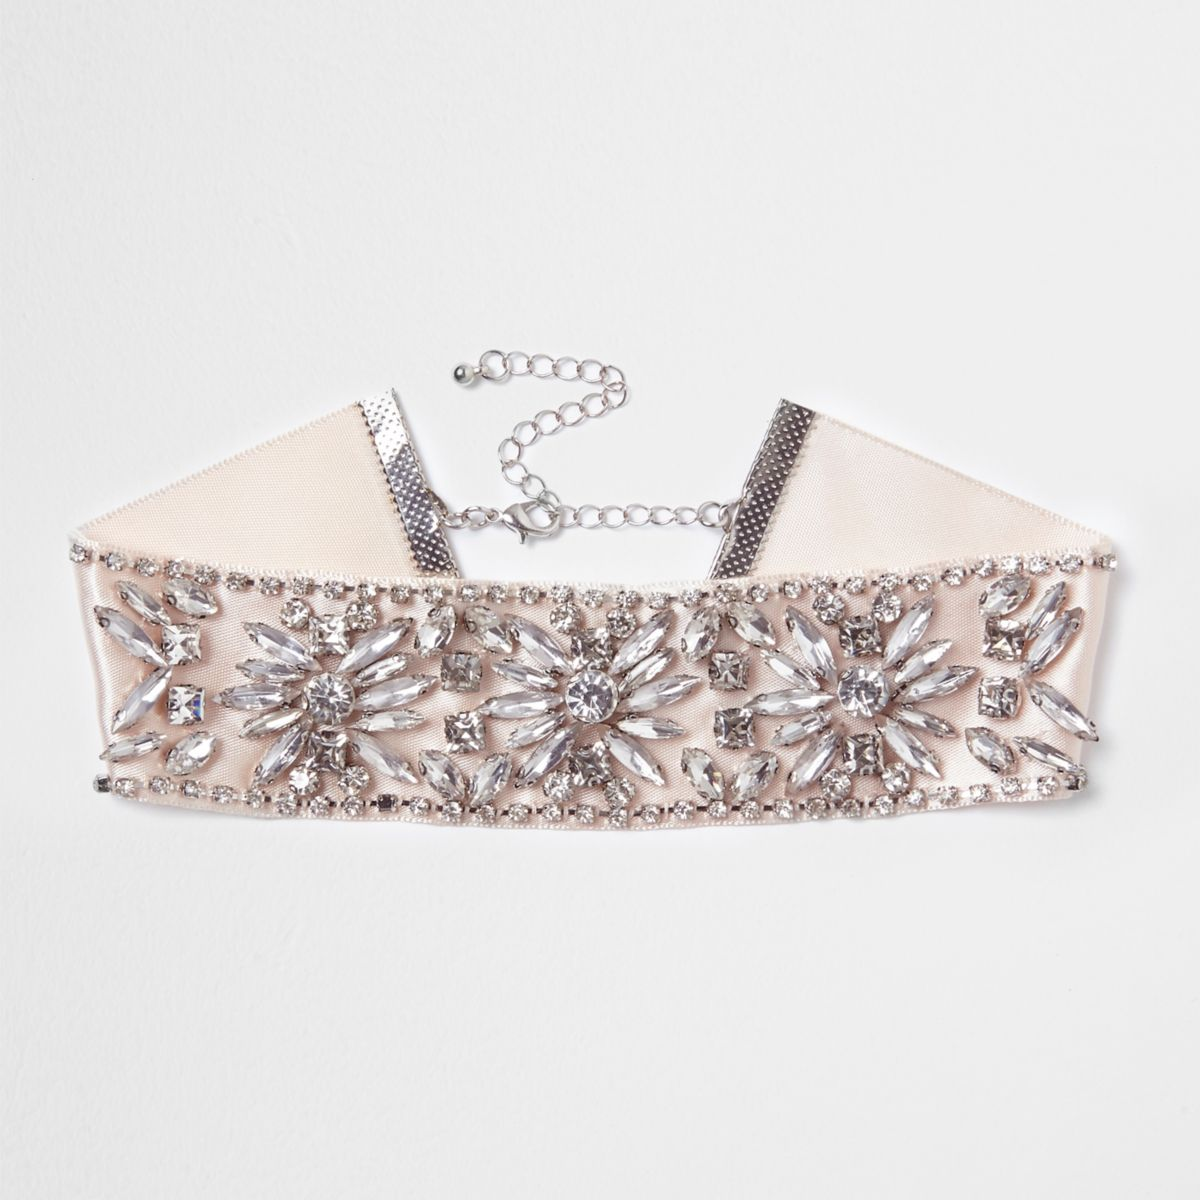 Light pink jewel embellished satin choker